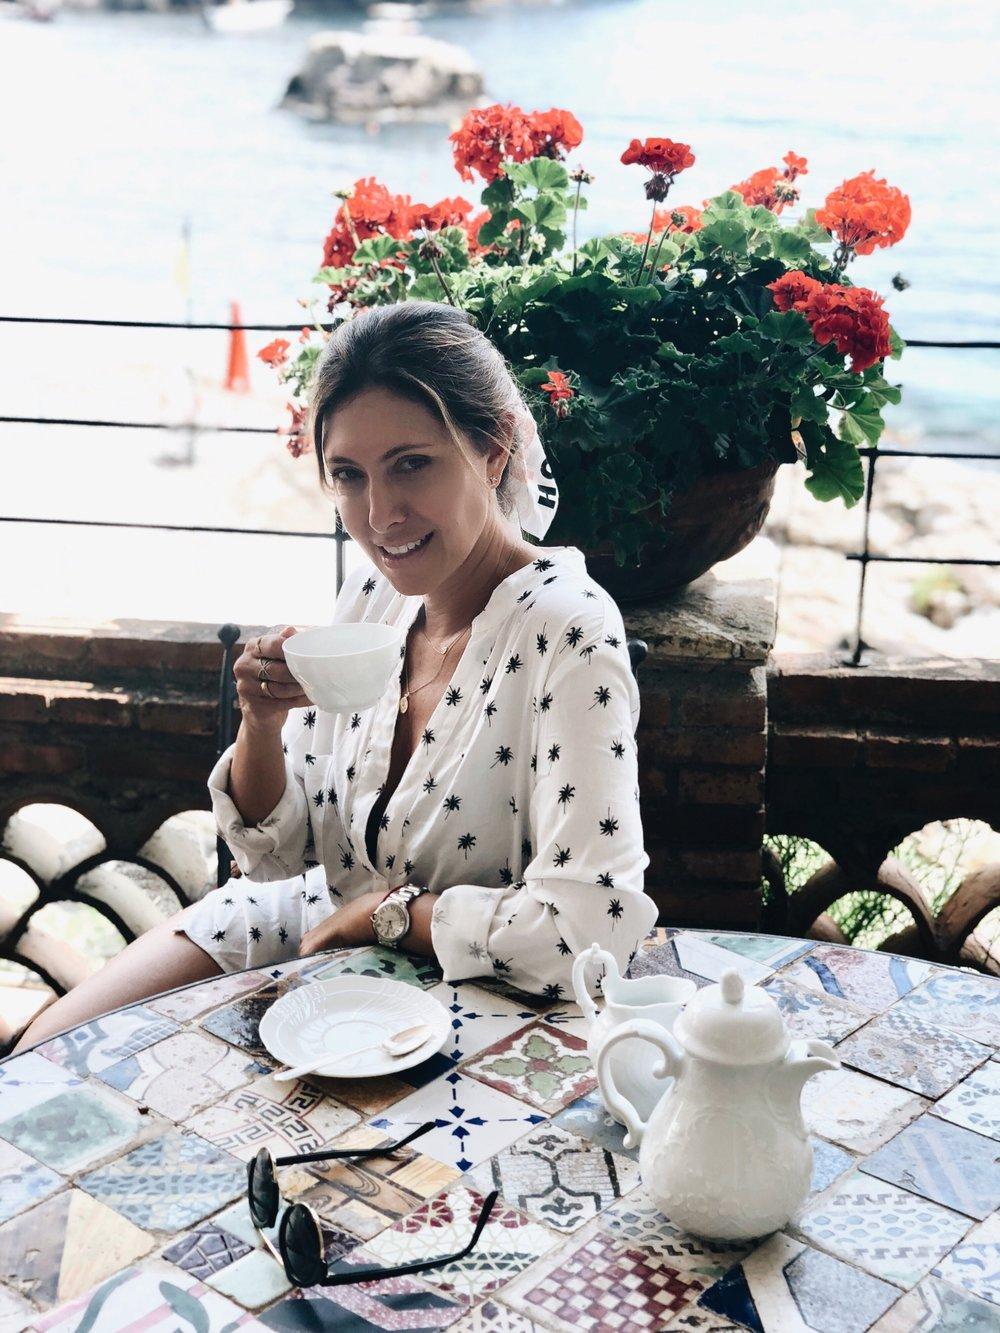 mm_Italy_coffee_2018.jpg